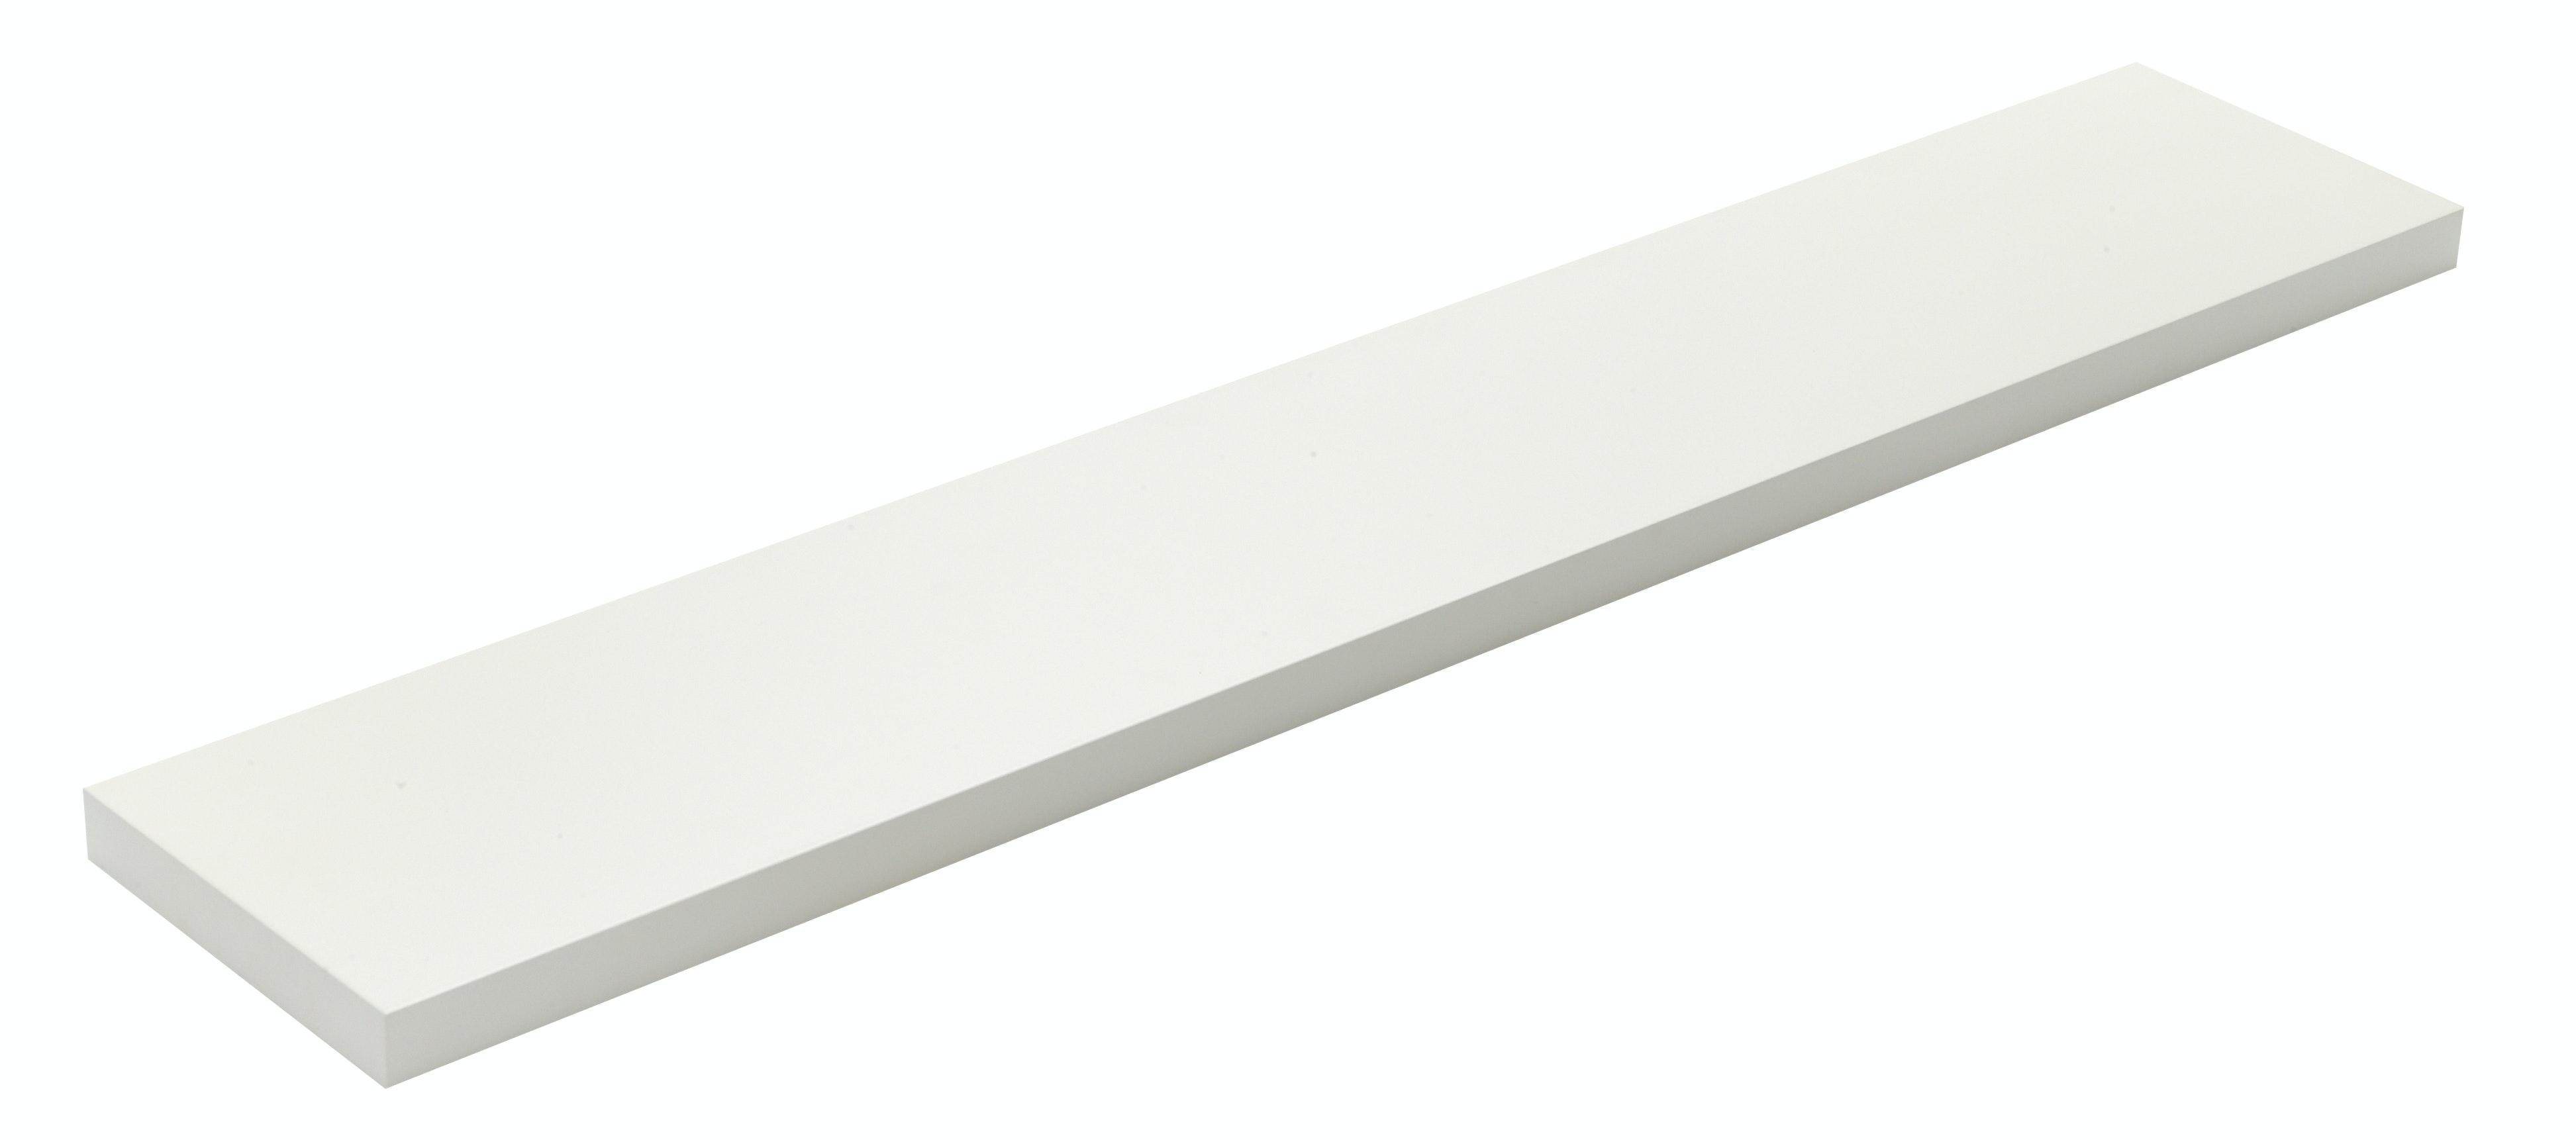 Fönsterbänk Lundbergs Nova Vilackad MDF 1600X180X28mm